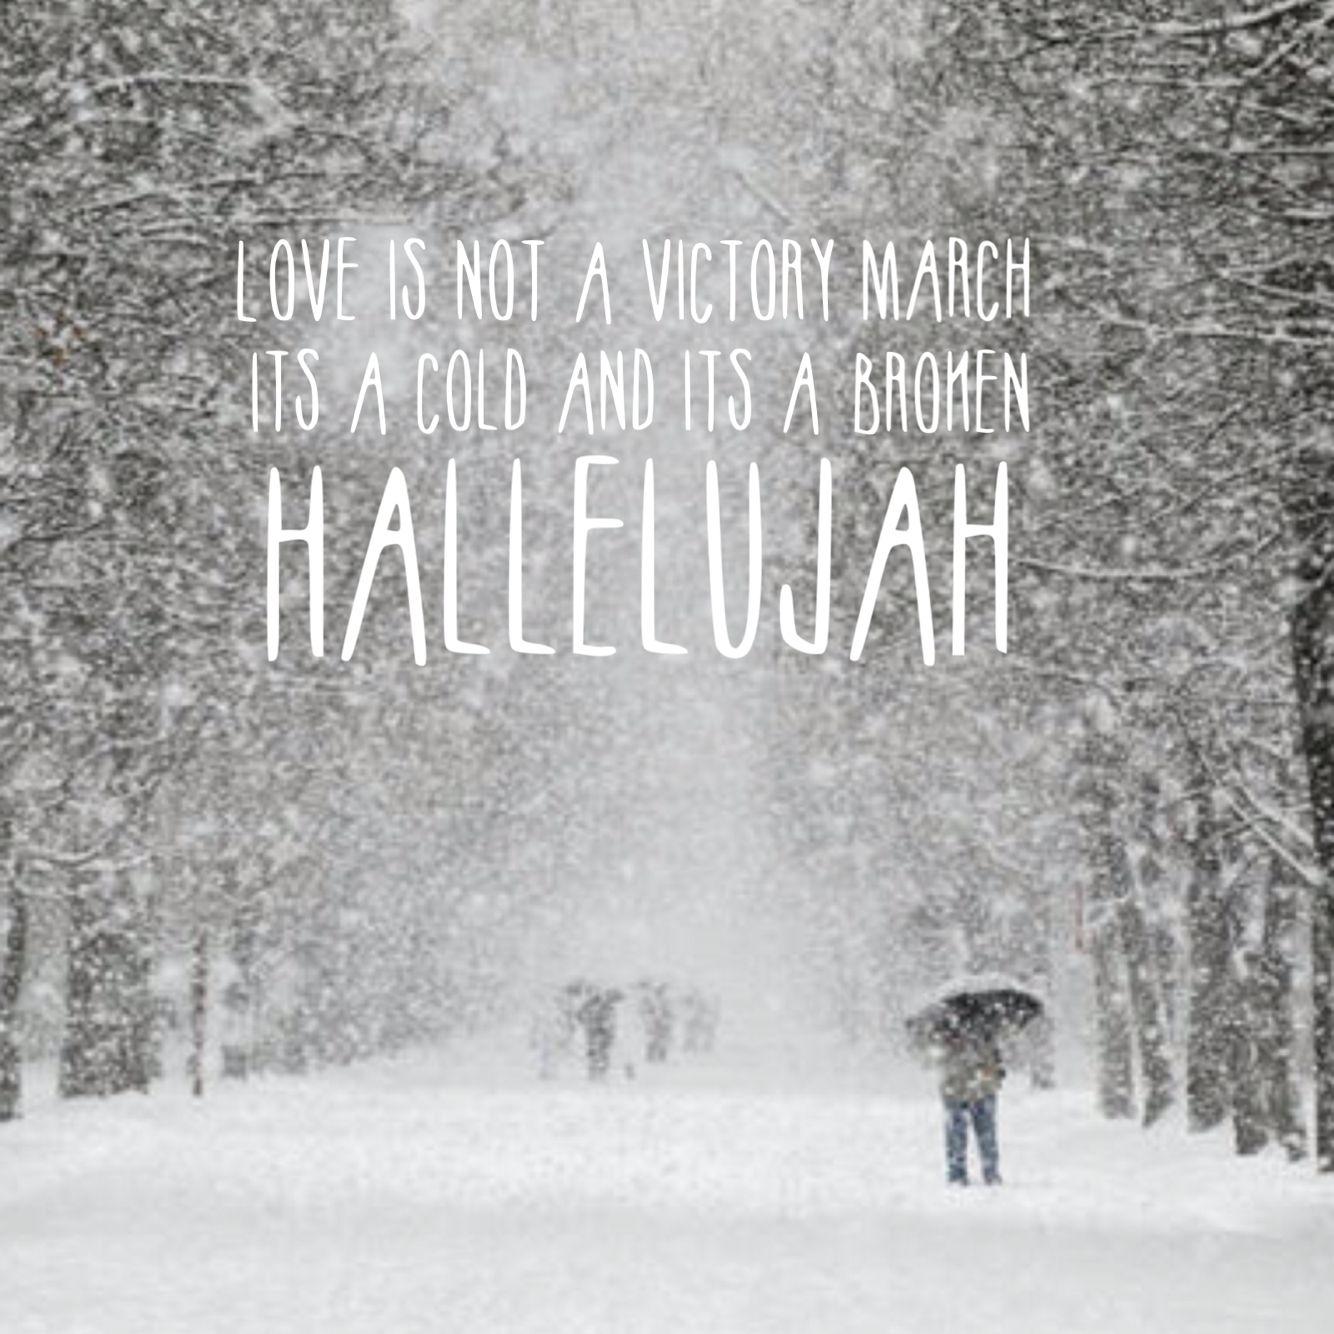 Hallelujah -Jeff Buckley | Hallelujah lyrics, Music quotes, Christmas lyrics